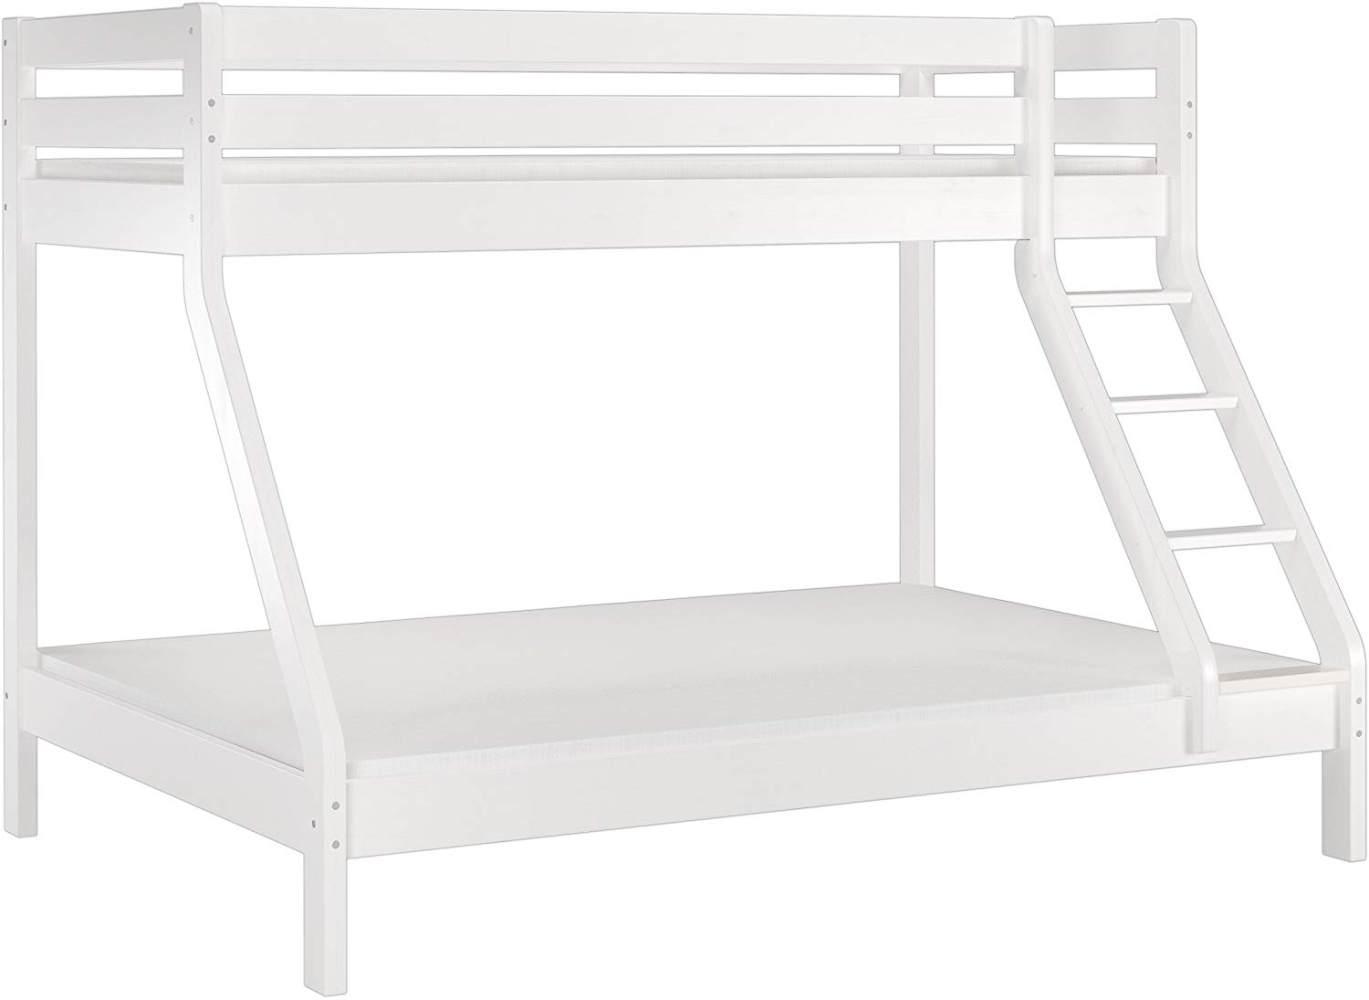 Erst-Holz Etagenbett Kiefer 90x200/140x200 cm, weiß Bild 1